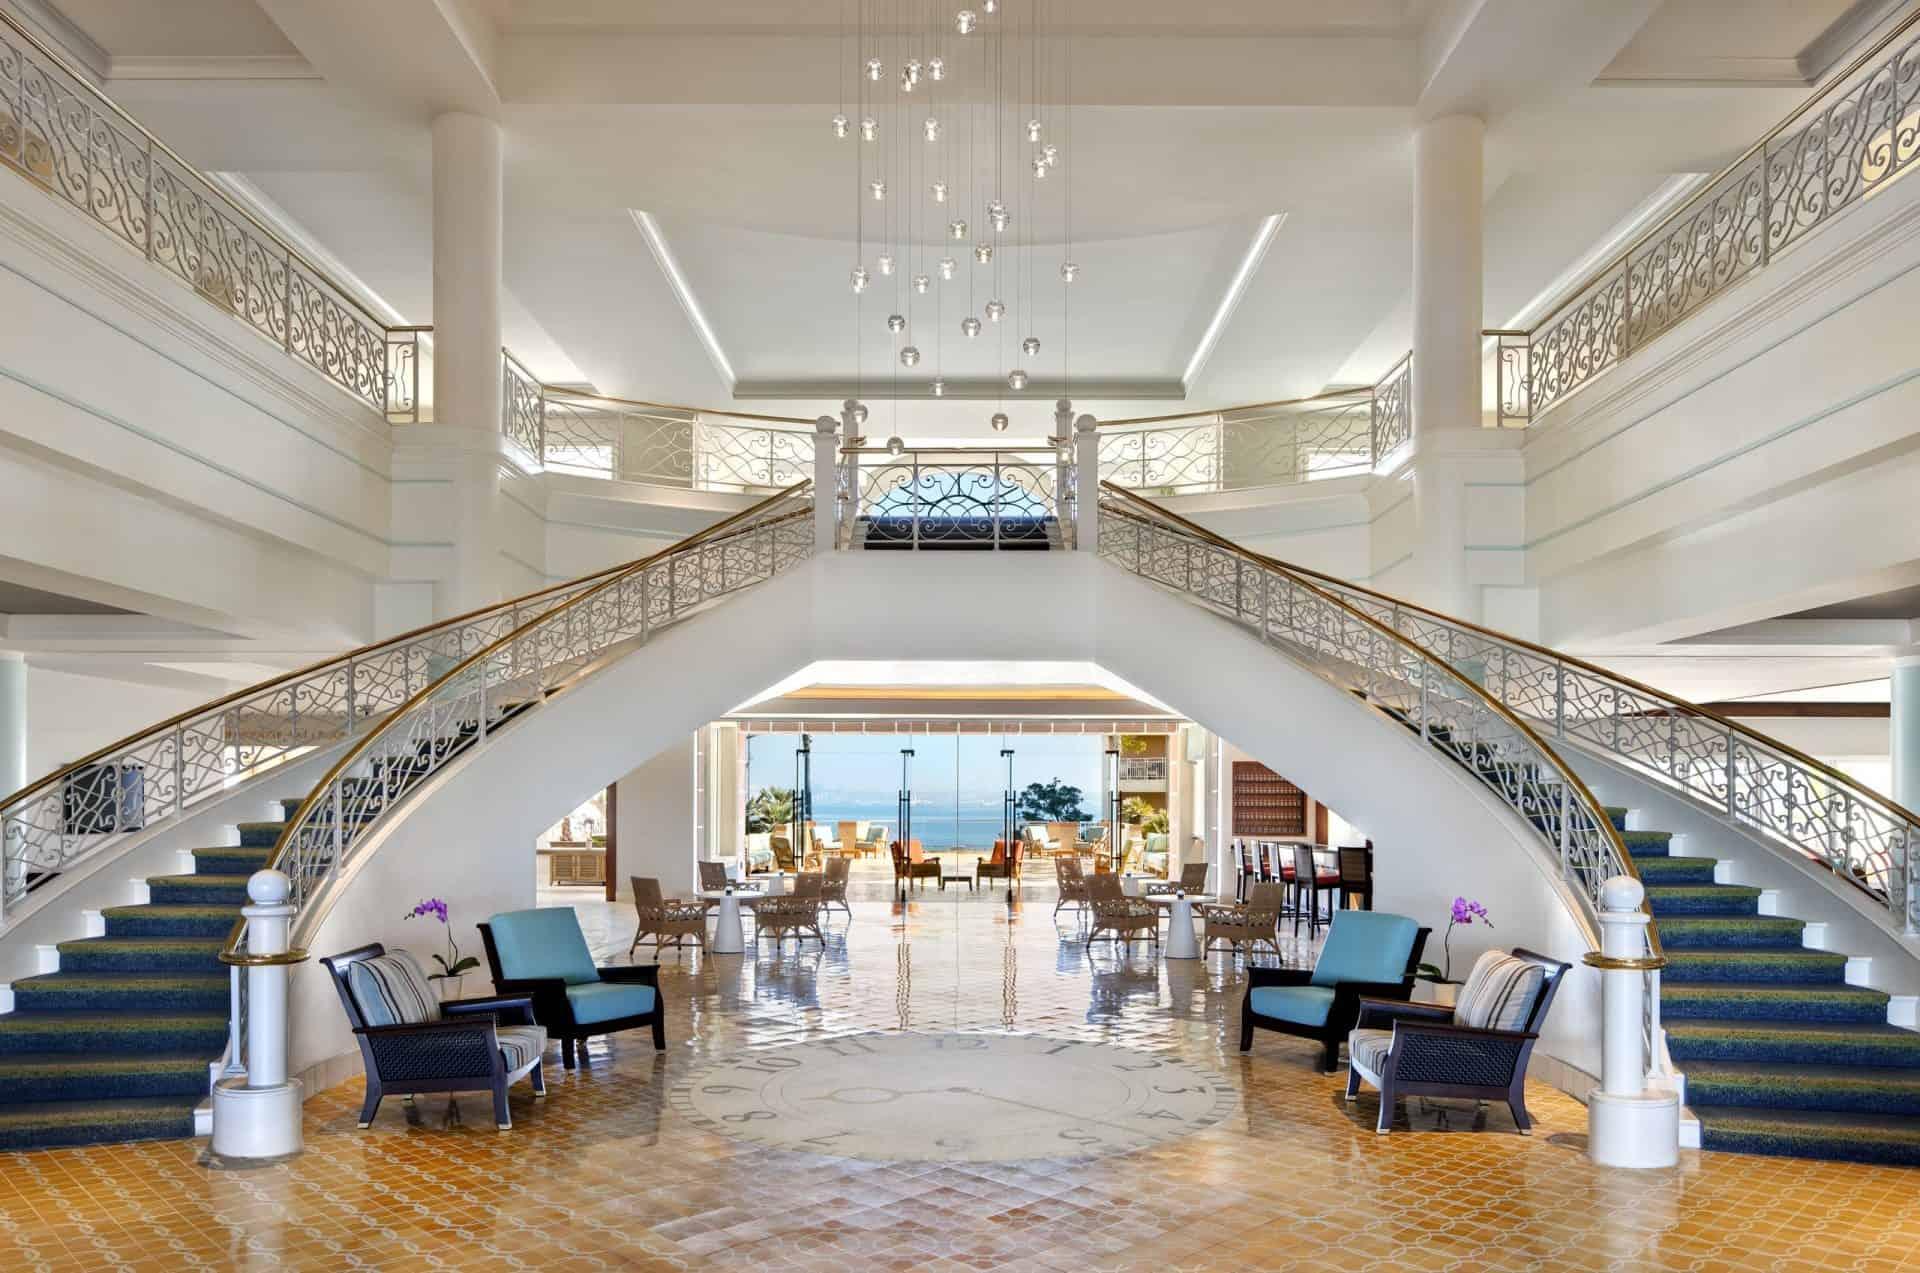 Loews Coronado Bay Resort California lobby staircase with yellow tiles and ocean views